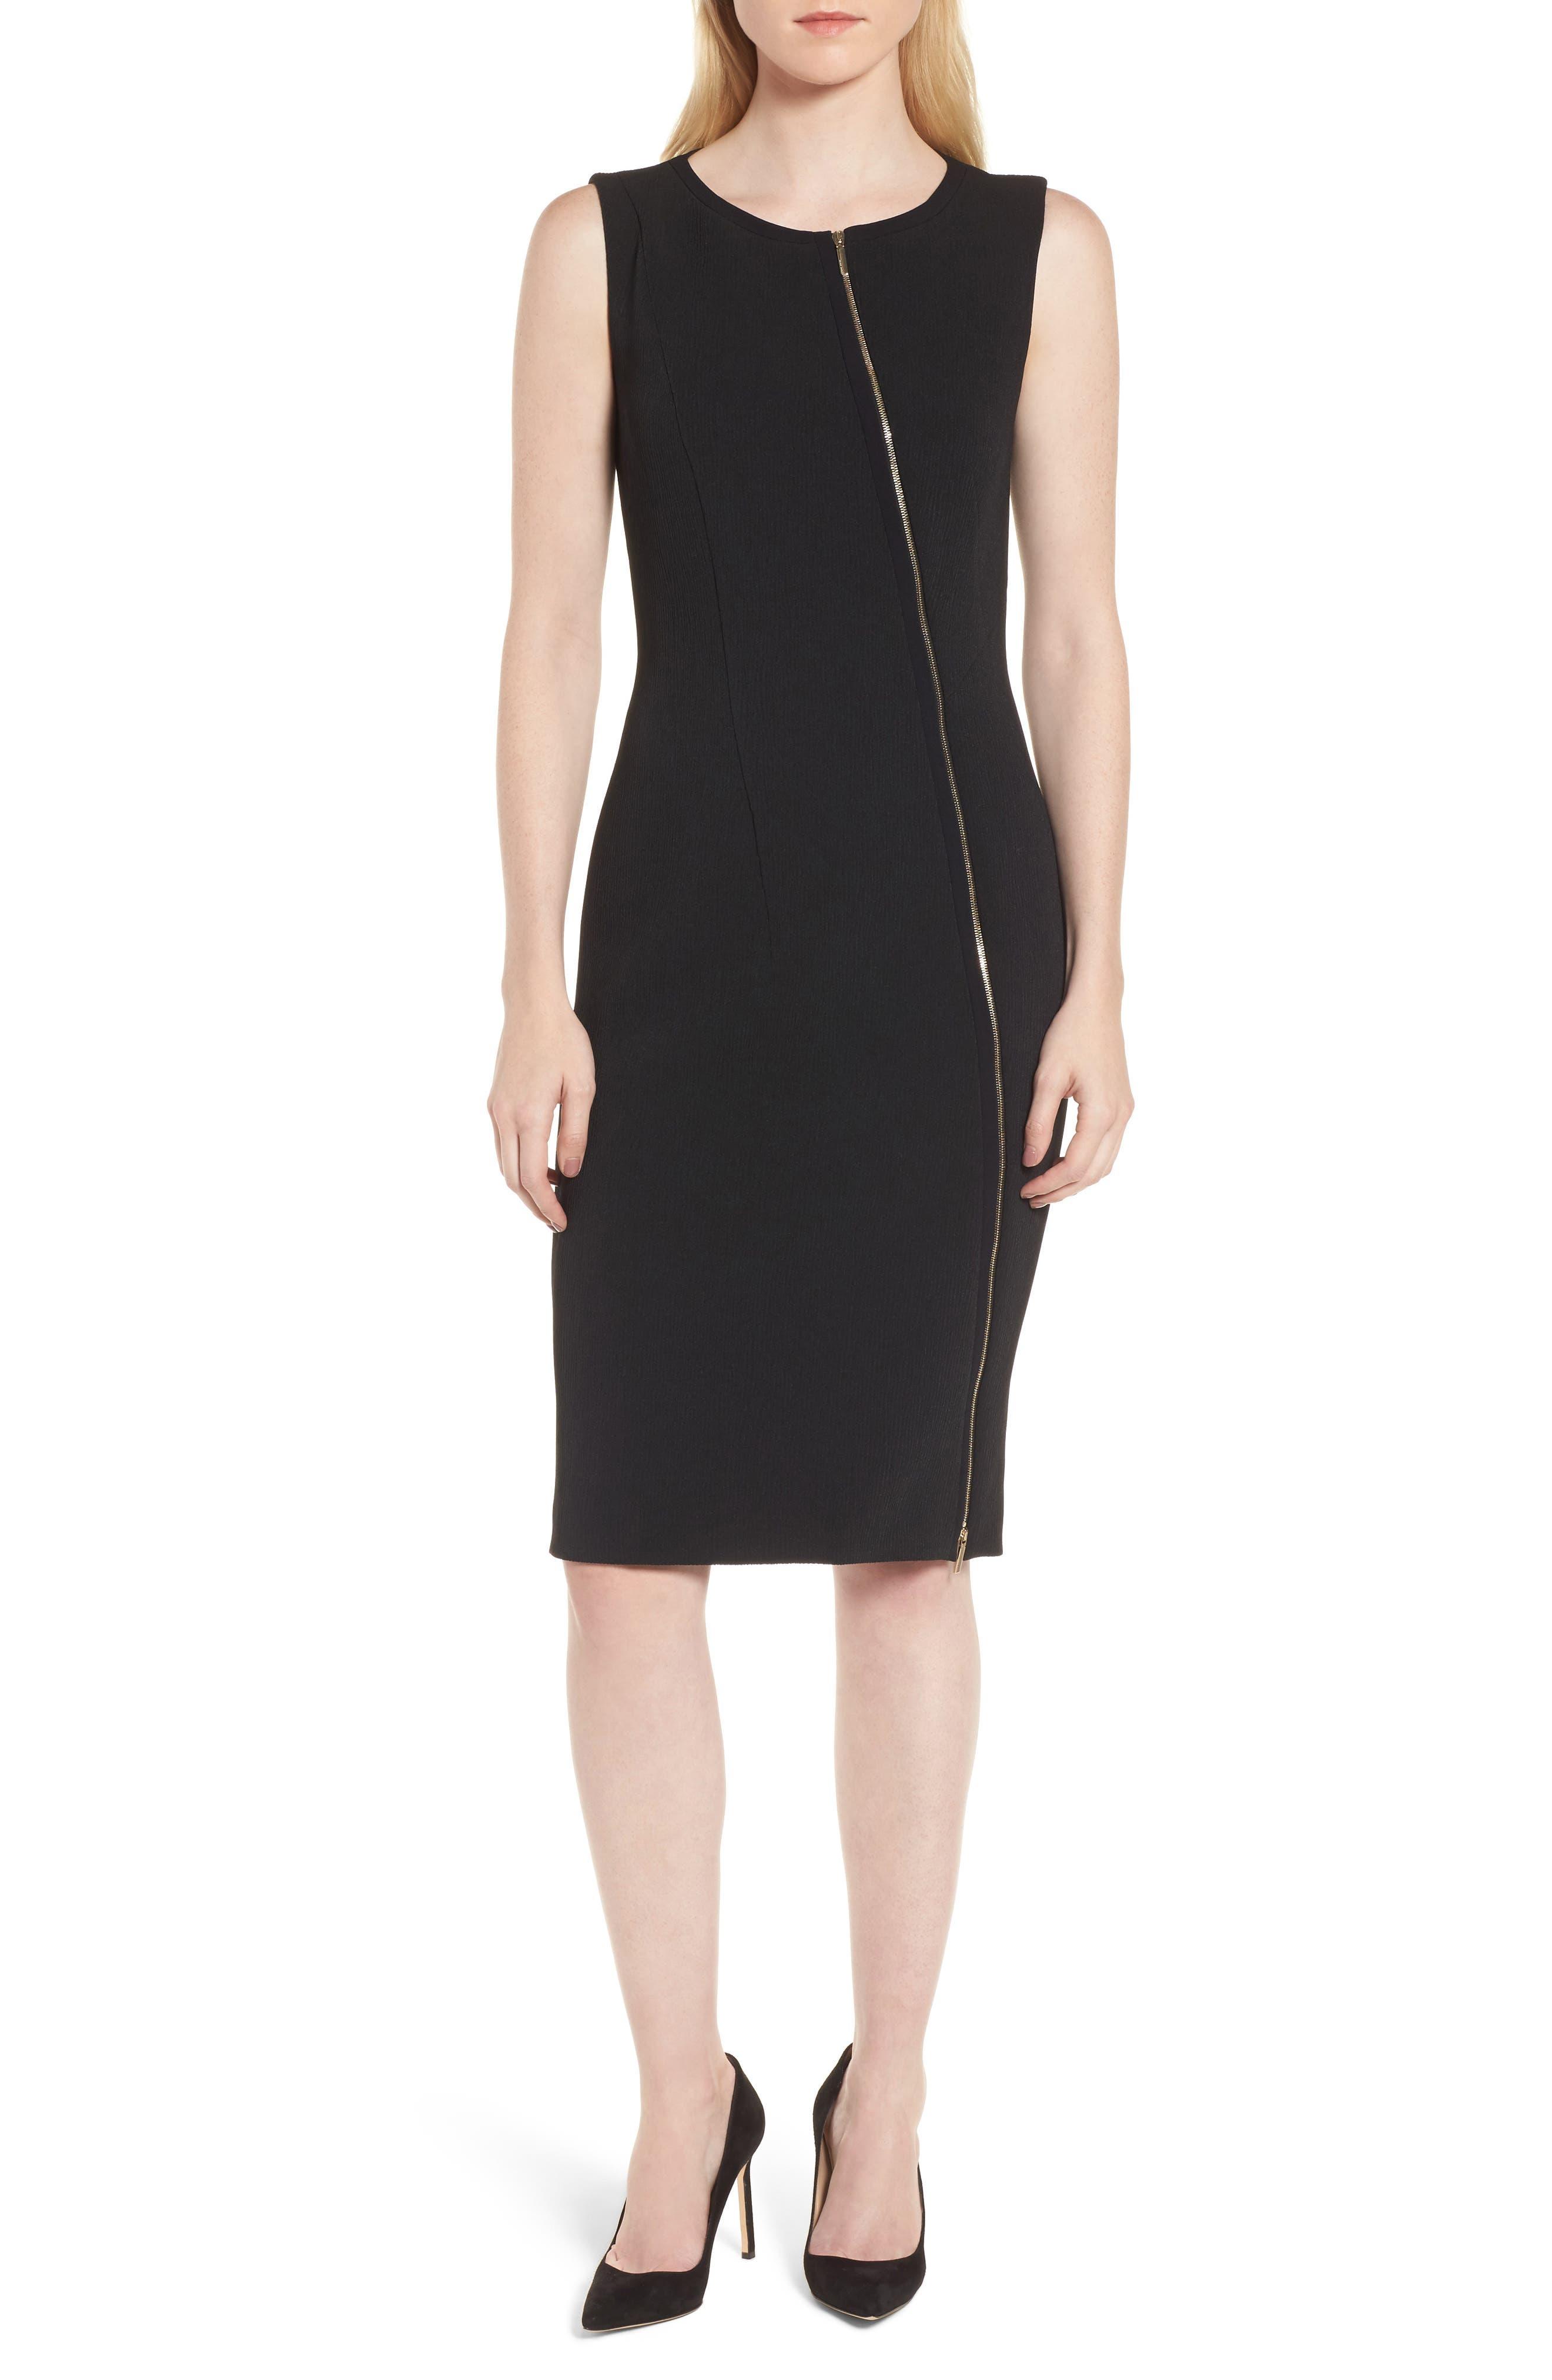 Danafea Dress,                         Main,                         color, 001